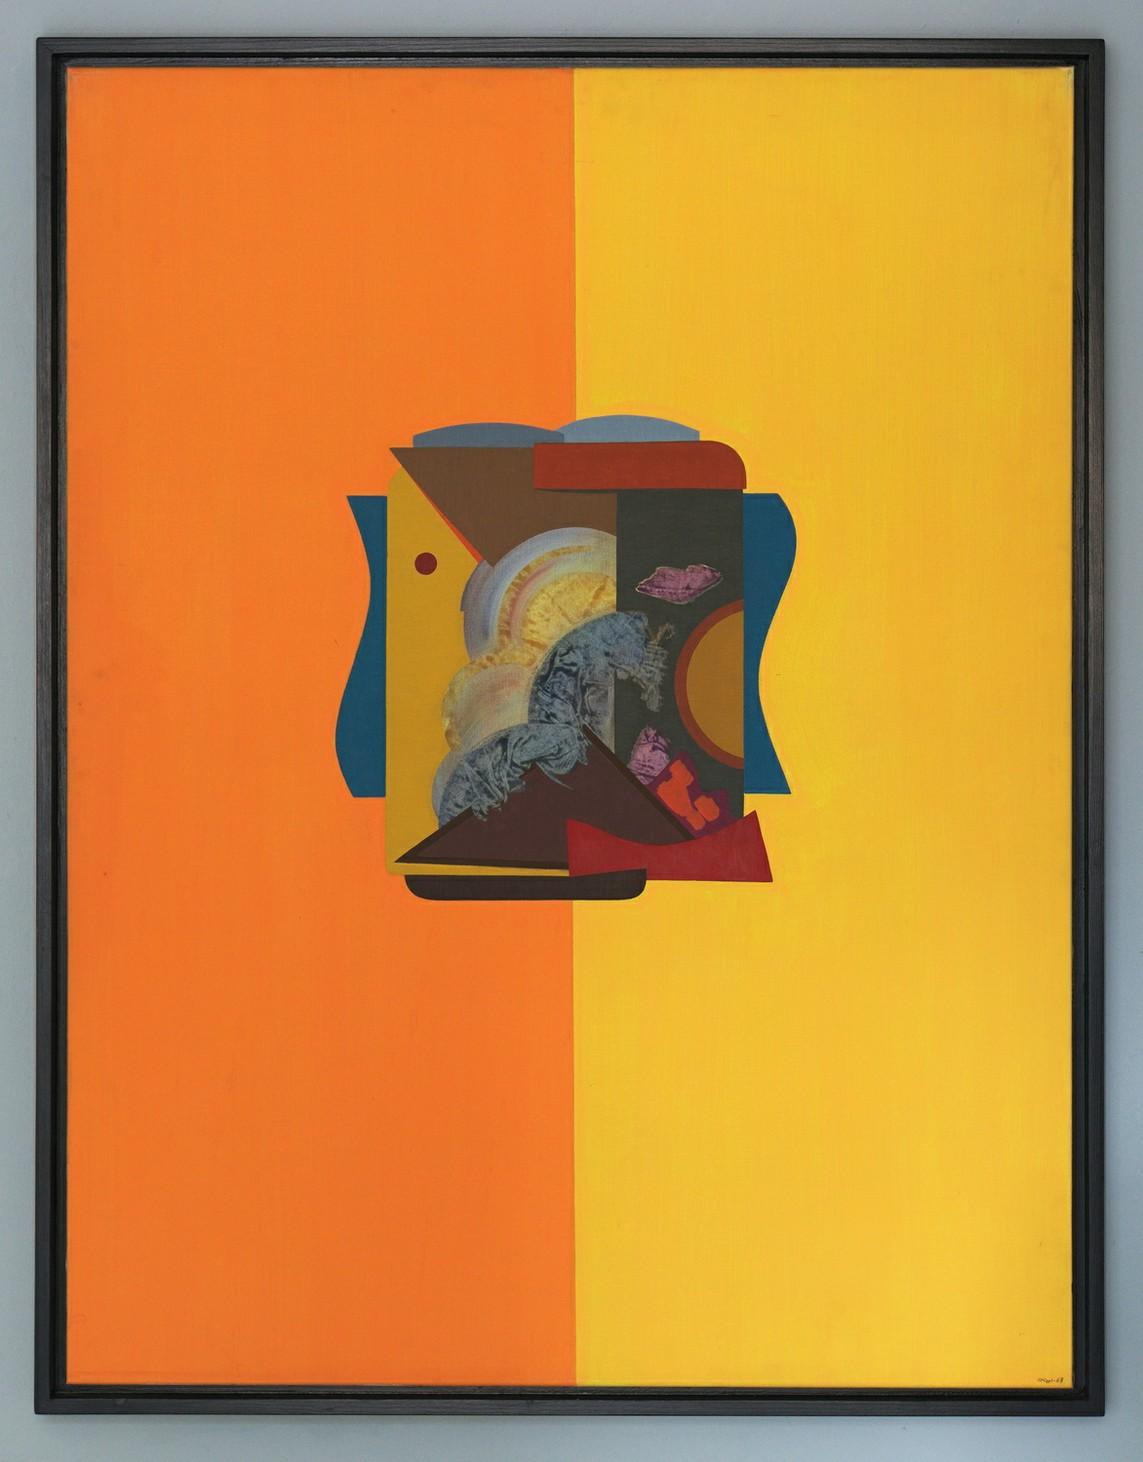 »HAUS (Positivist)« Öl auf Leinwand, 116,5 x 89,5 cm, 1967